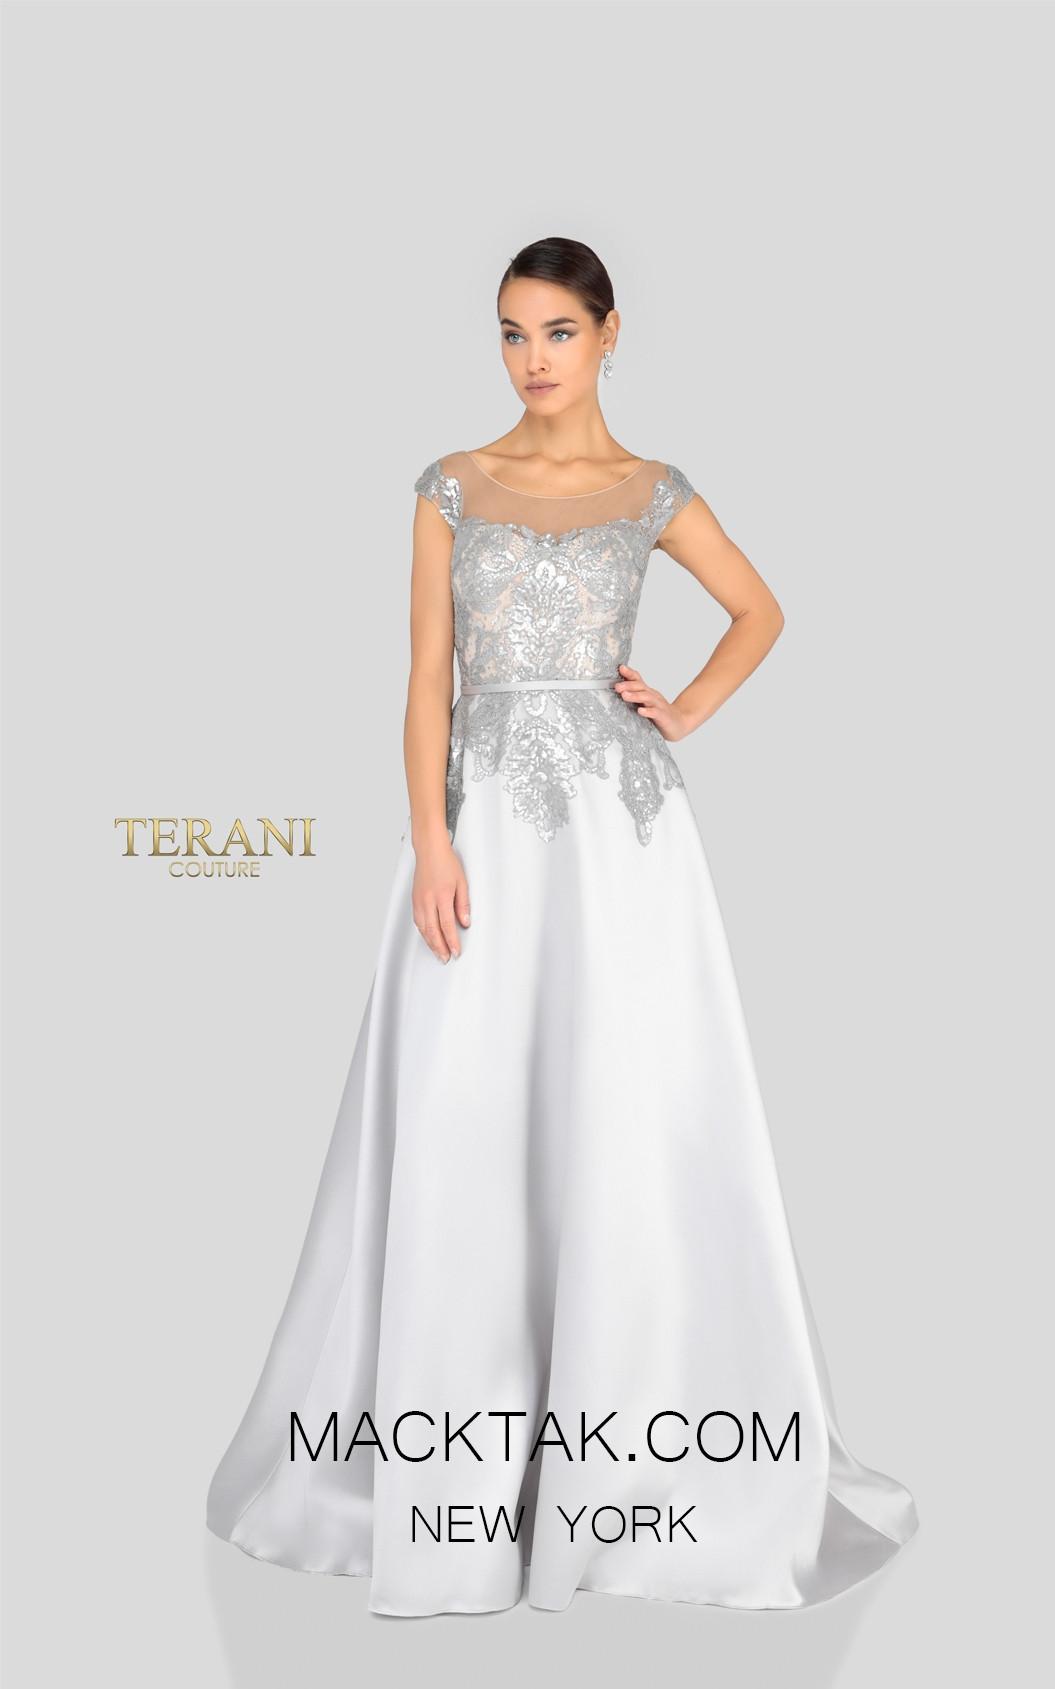 Terani 1913E9285 Silver Nude Front Evening Dress